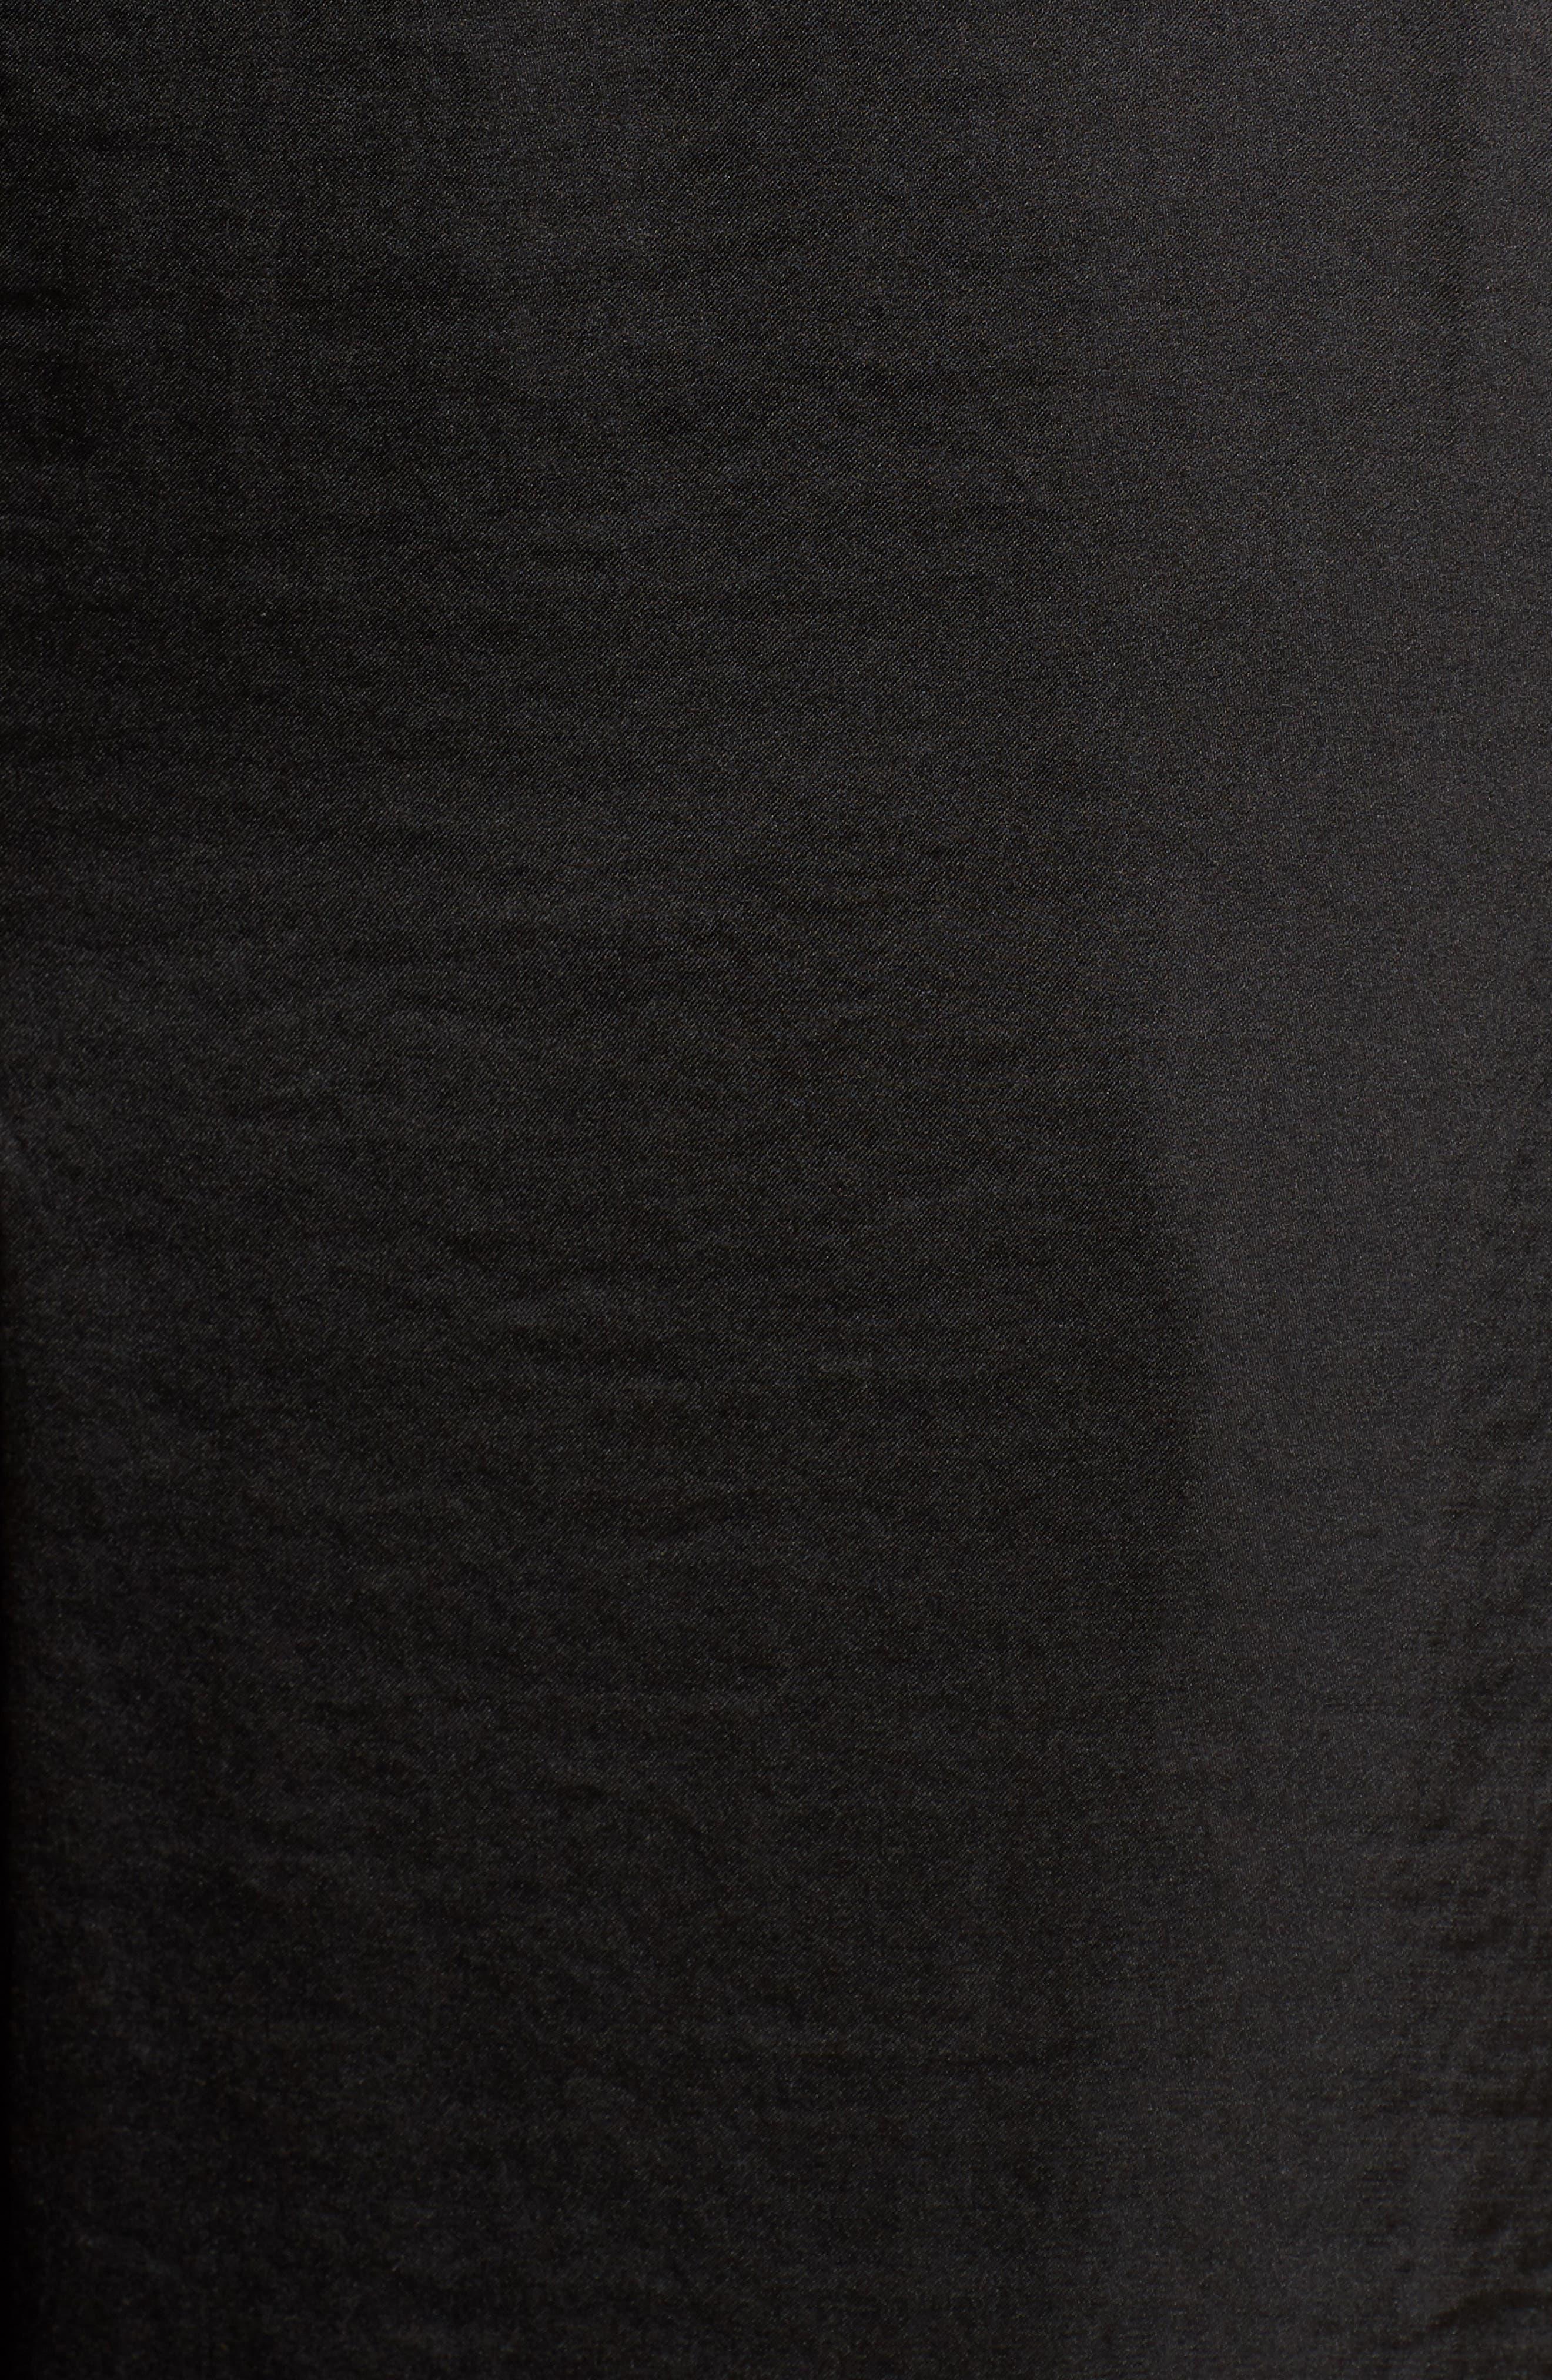 Kenneth Cole Wide Leg Pants,                             Alternate thumbnail 6, color,                             Black